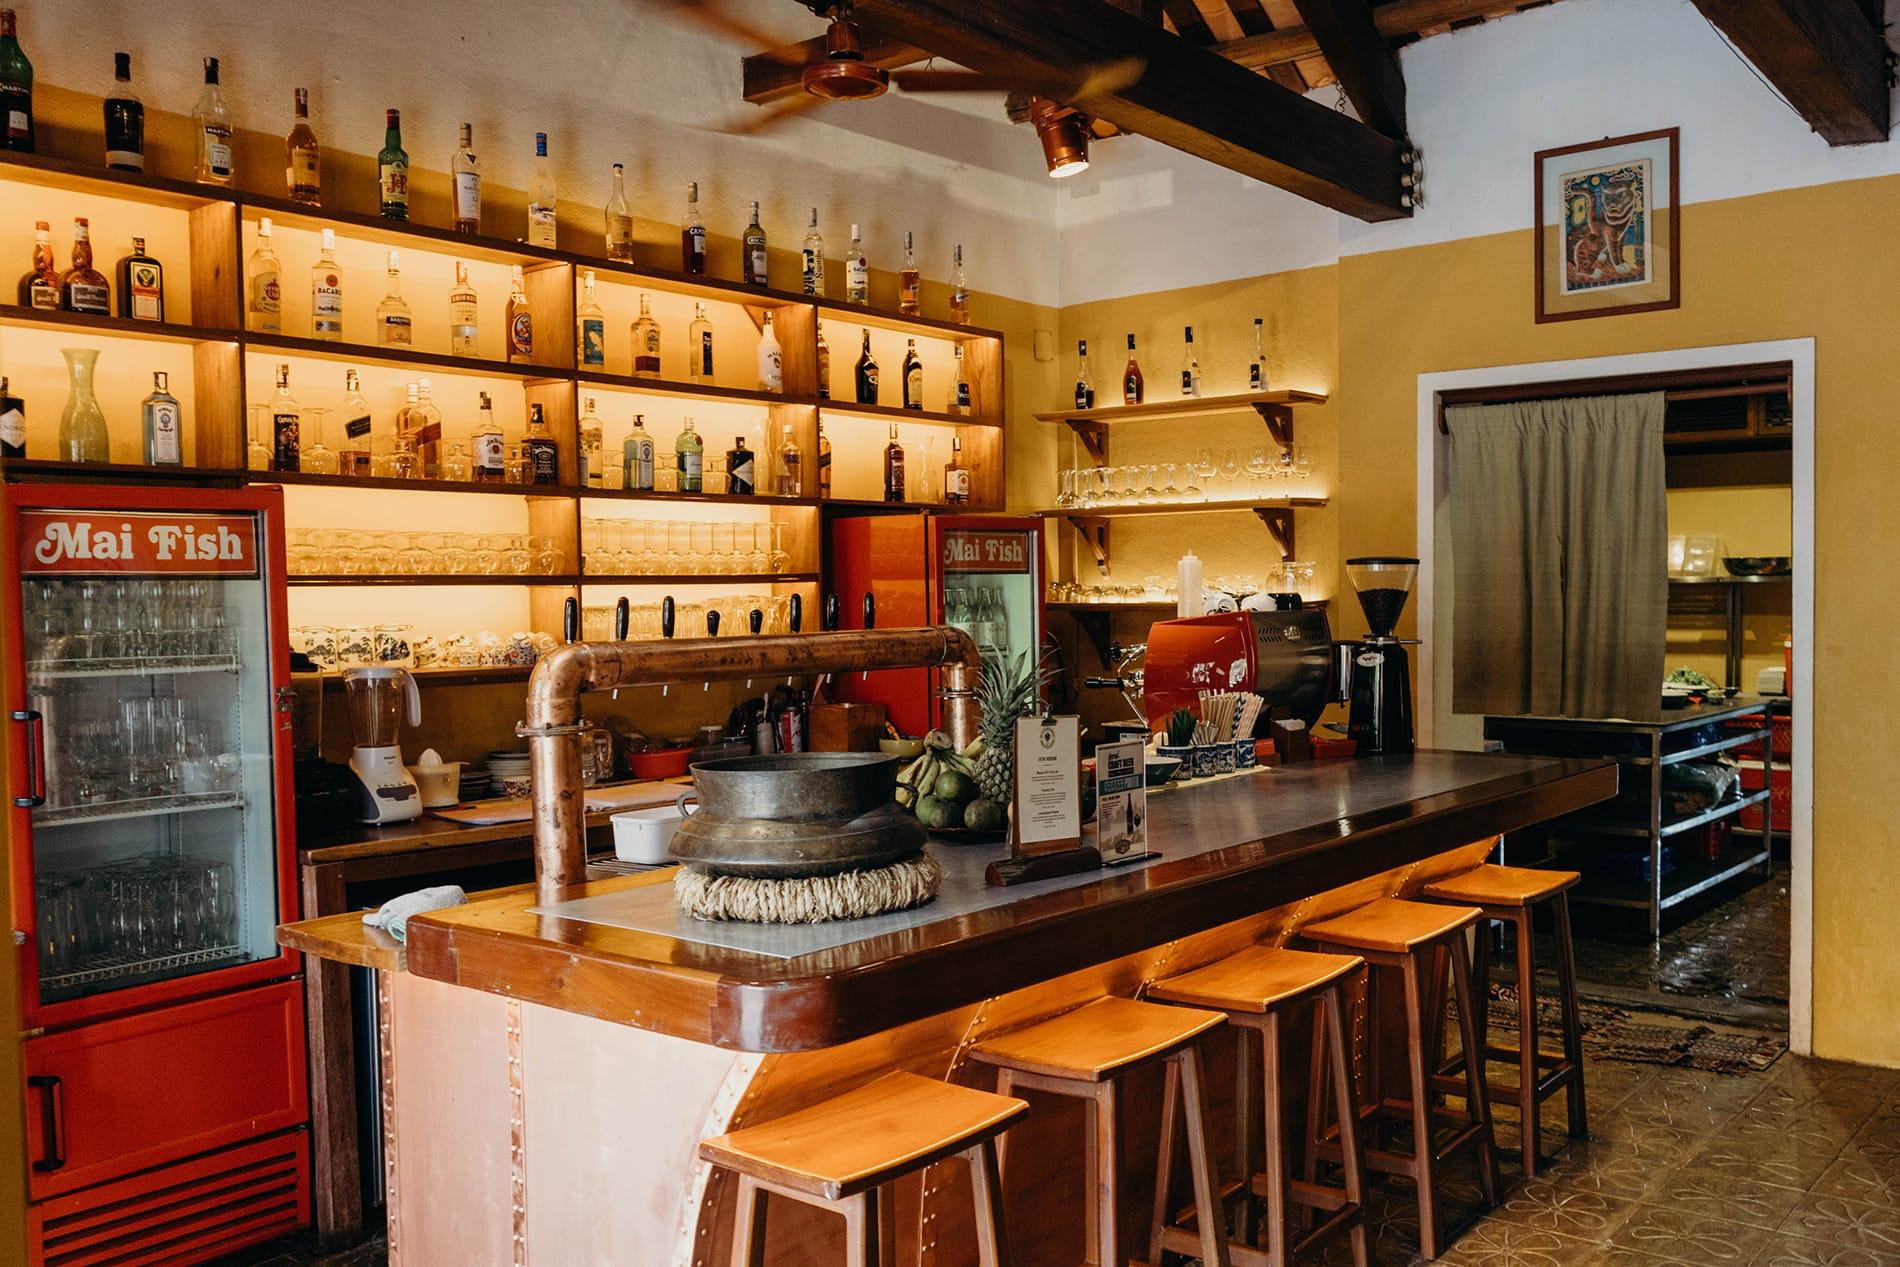 The bar at Mai Fish Restaurant